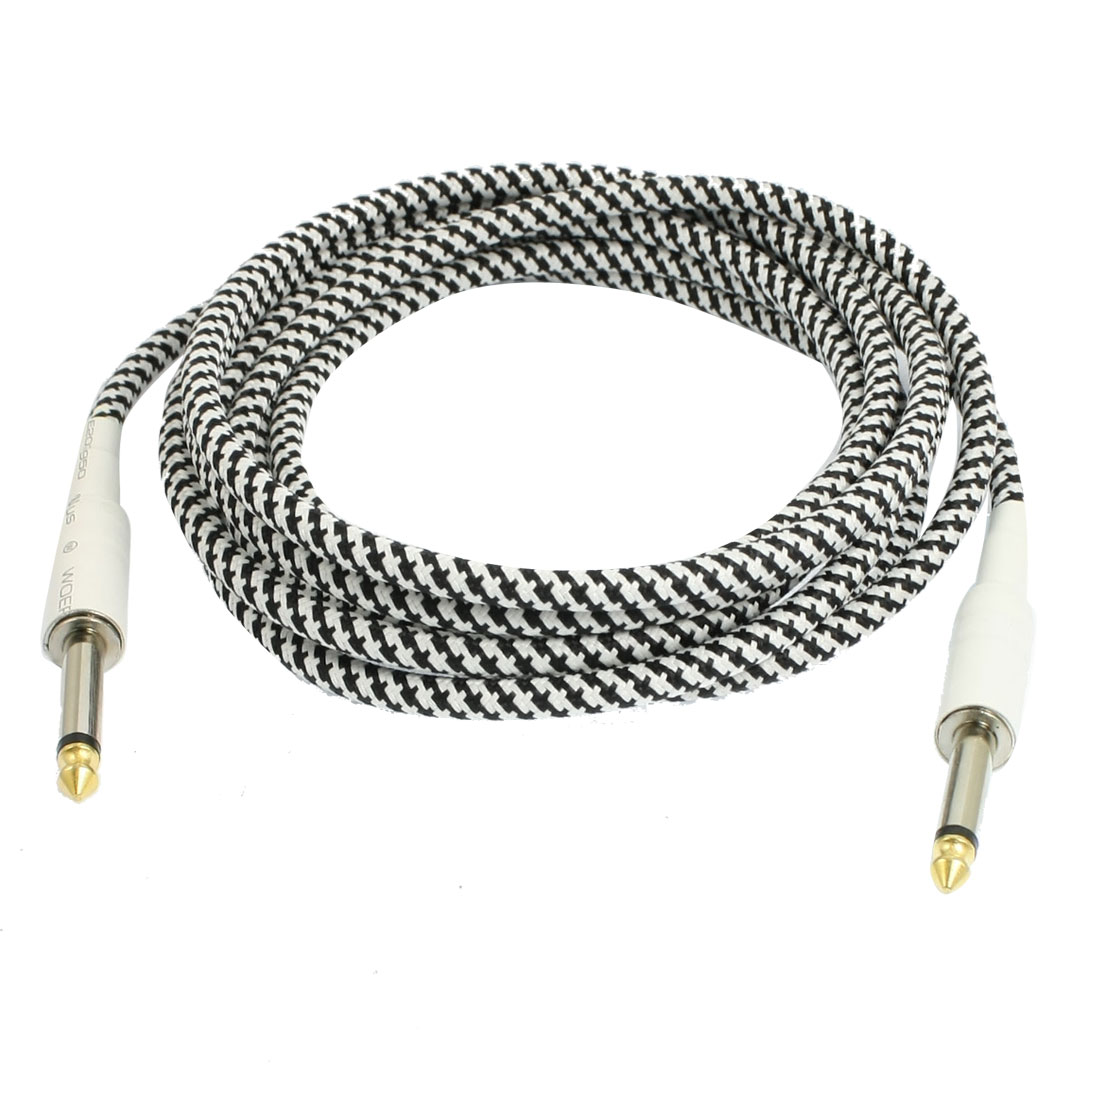 6.3mm Plug Braided Tweed Guitar Cable Cord White Black 3 Meters 9.8 Ft